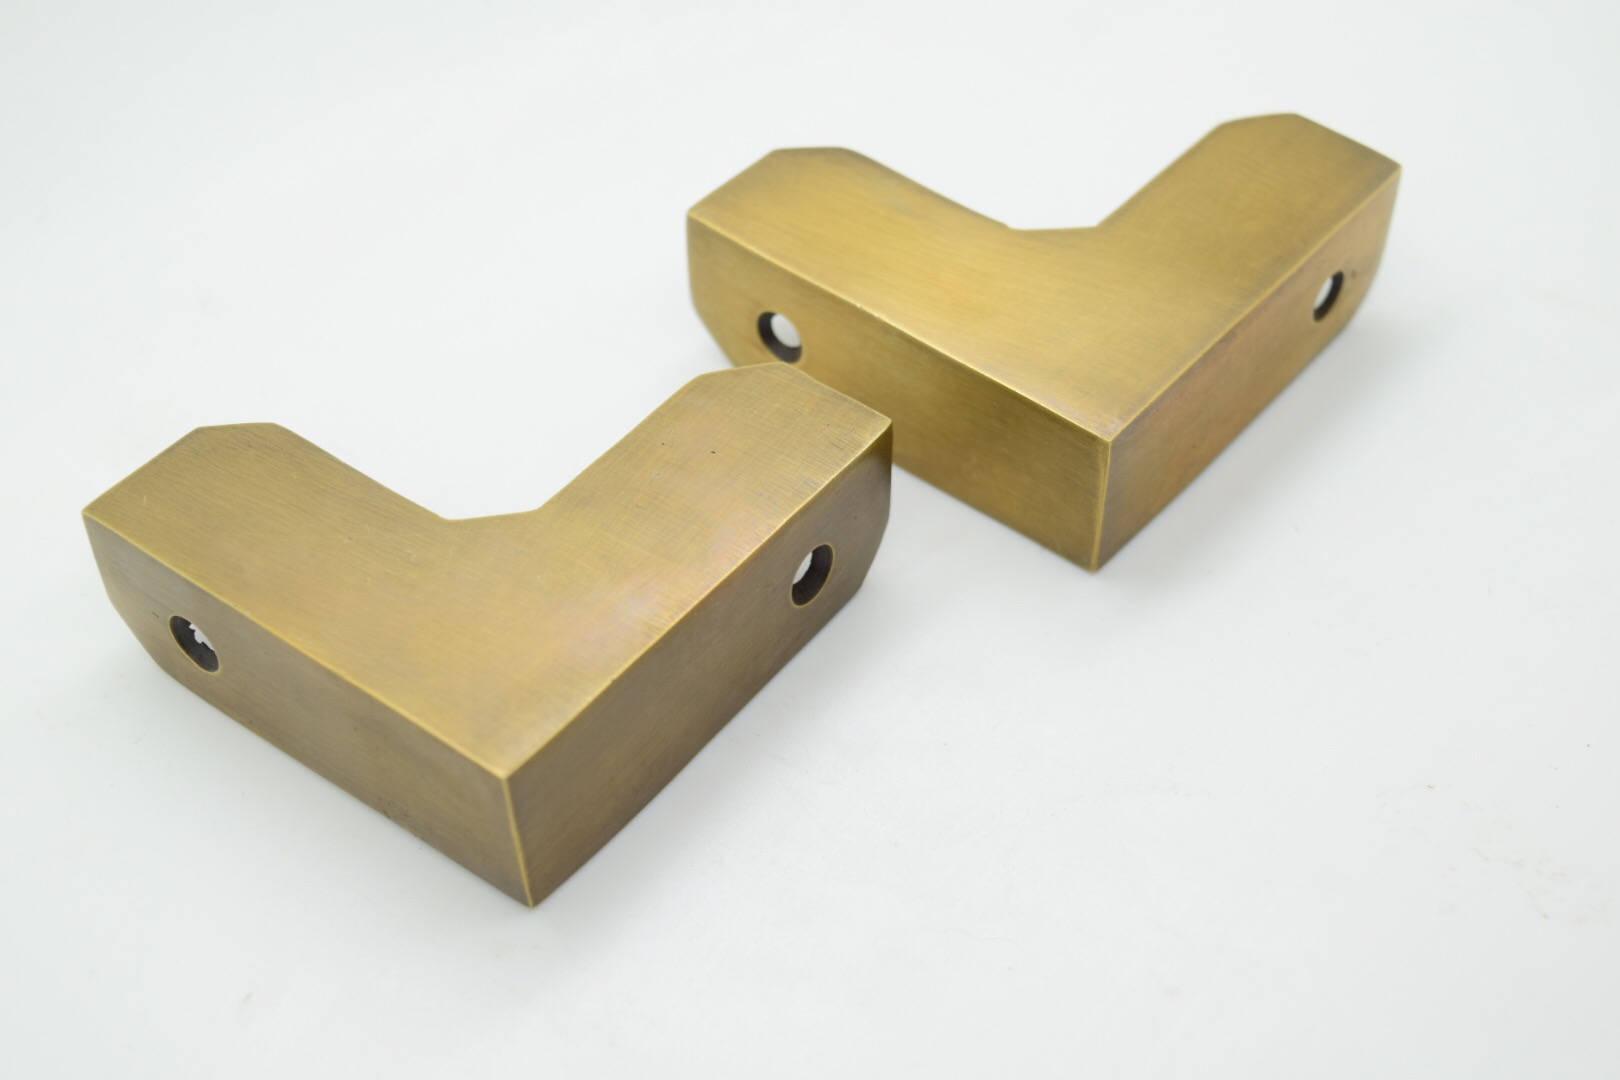 Messing Kanten Ecken. Messing-Hardware. Küche Griffe. Knäufe. | Etsy